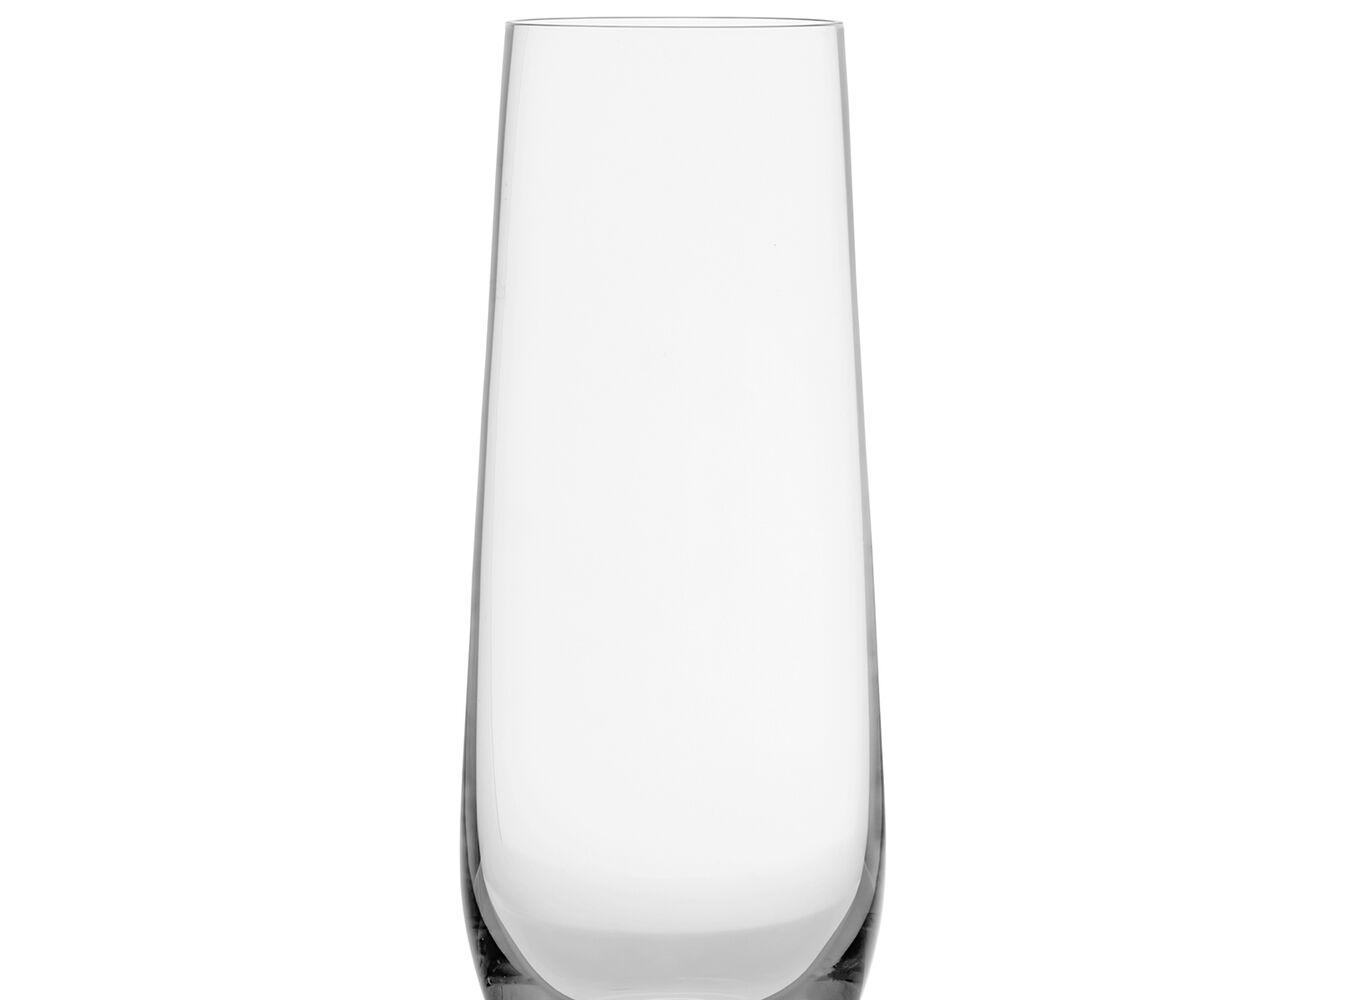 Schott Zwiesel Forte Champagne Glasses, Set of 6 | Sur La Table